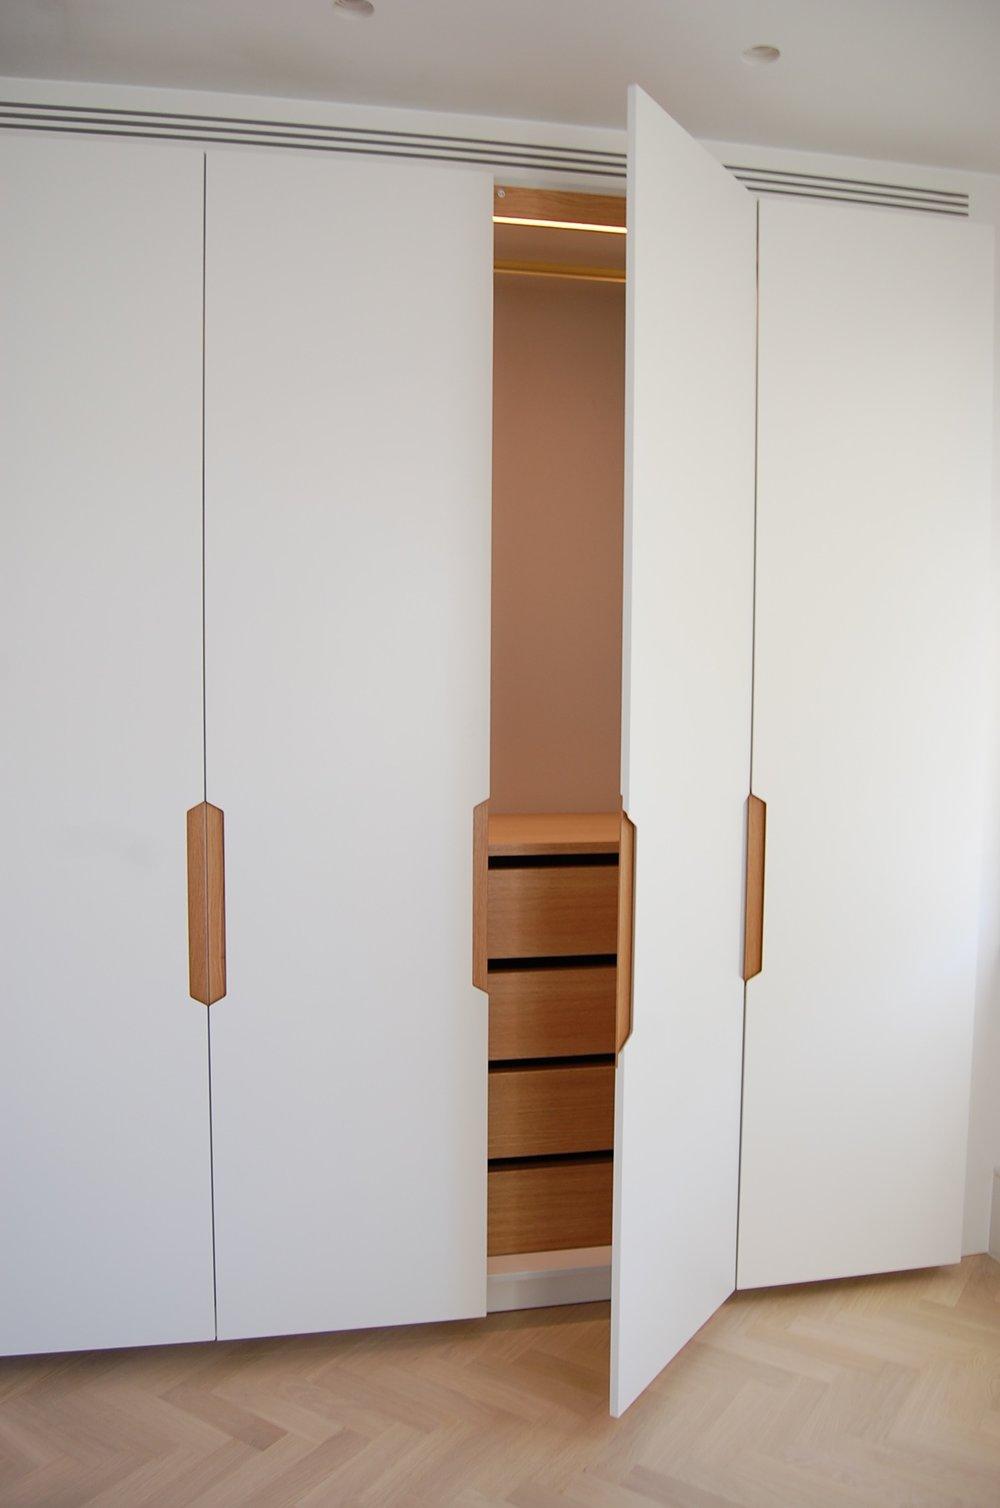 Grain_Bespoke_Furniture_Chelsea_Wardrobe_4.jpg